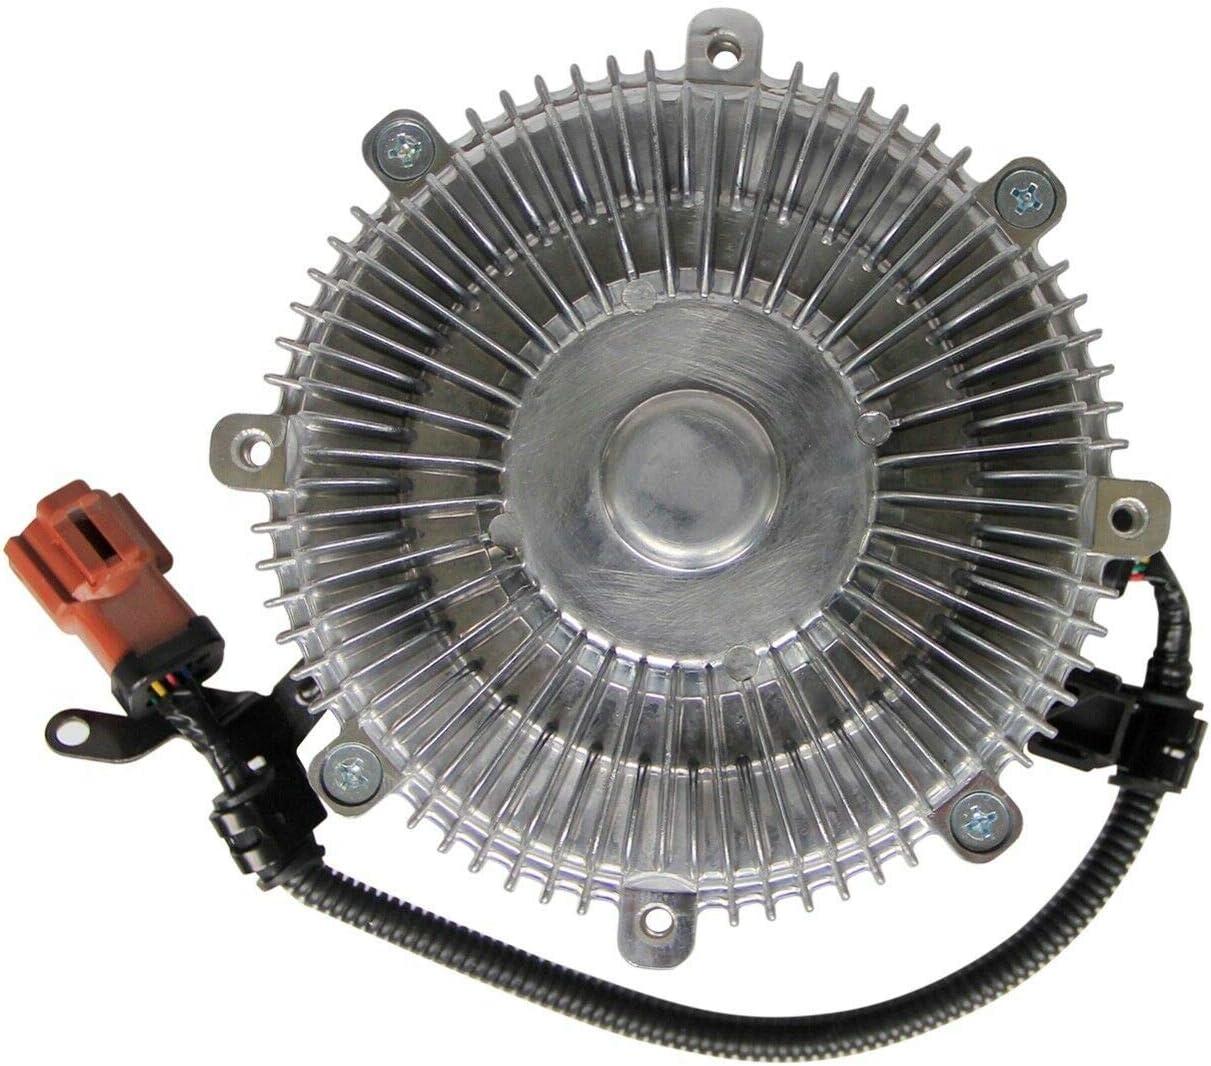 MOCA Electric Cooling Fan Clutch for 07-08 Ford Expedition F-150 Lobo /& Lincoln Mark LT Navigator 5.4L V8 /& 07-08 Ford F-150 4.6L